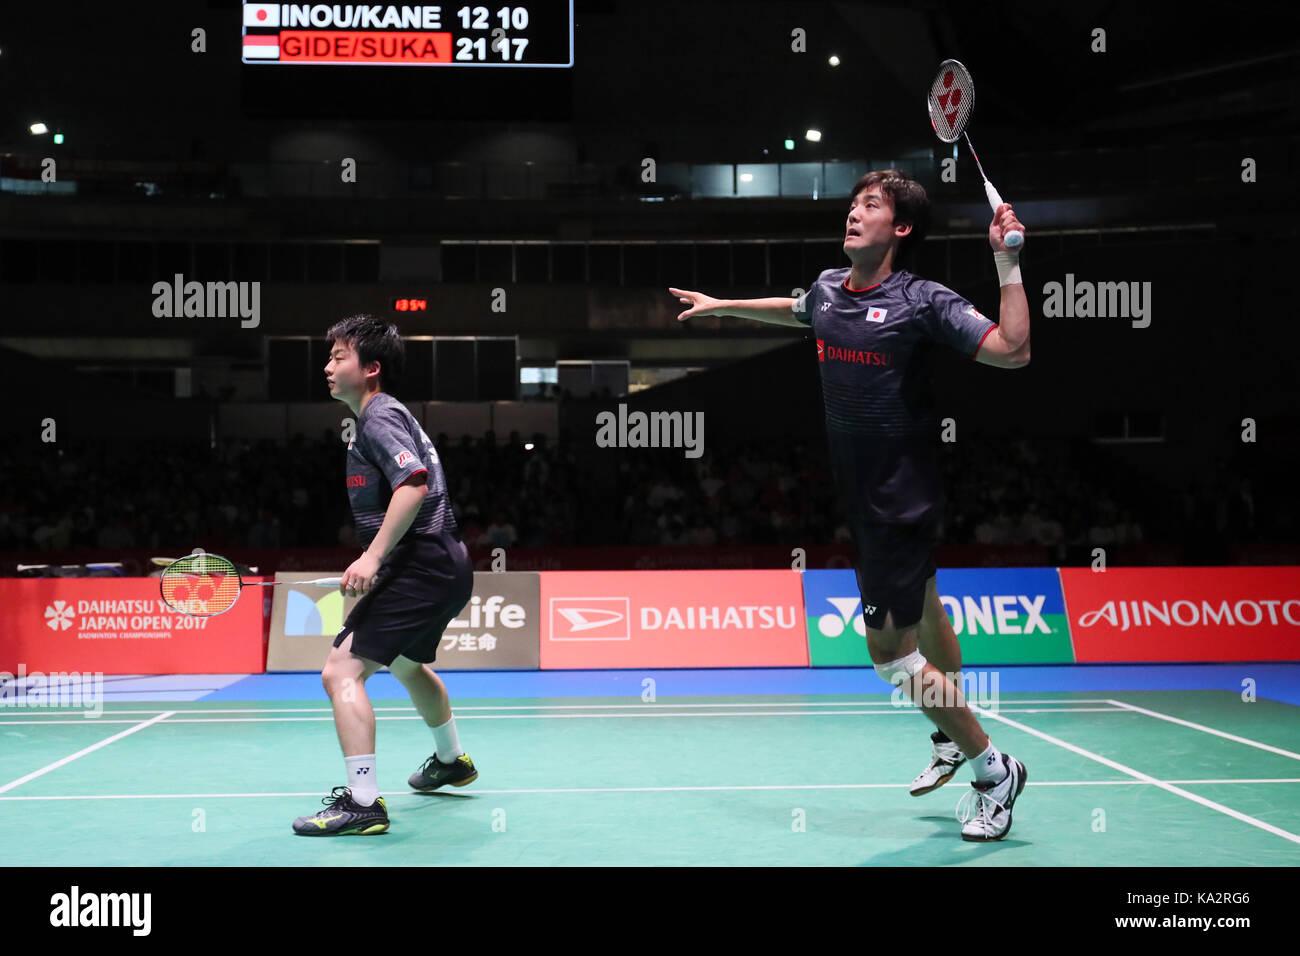 Takuto Inoue Jpn Yuki Jpn Stock s & Takuto Inoue Jpn Yuki Jpn